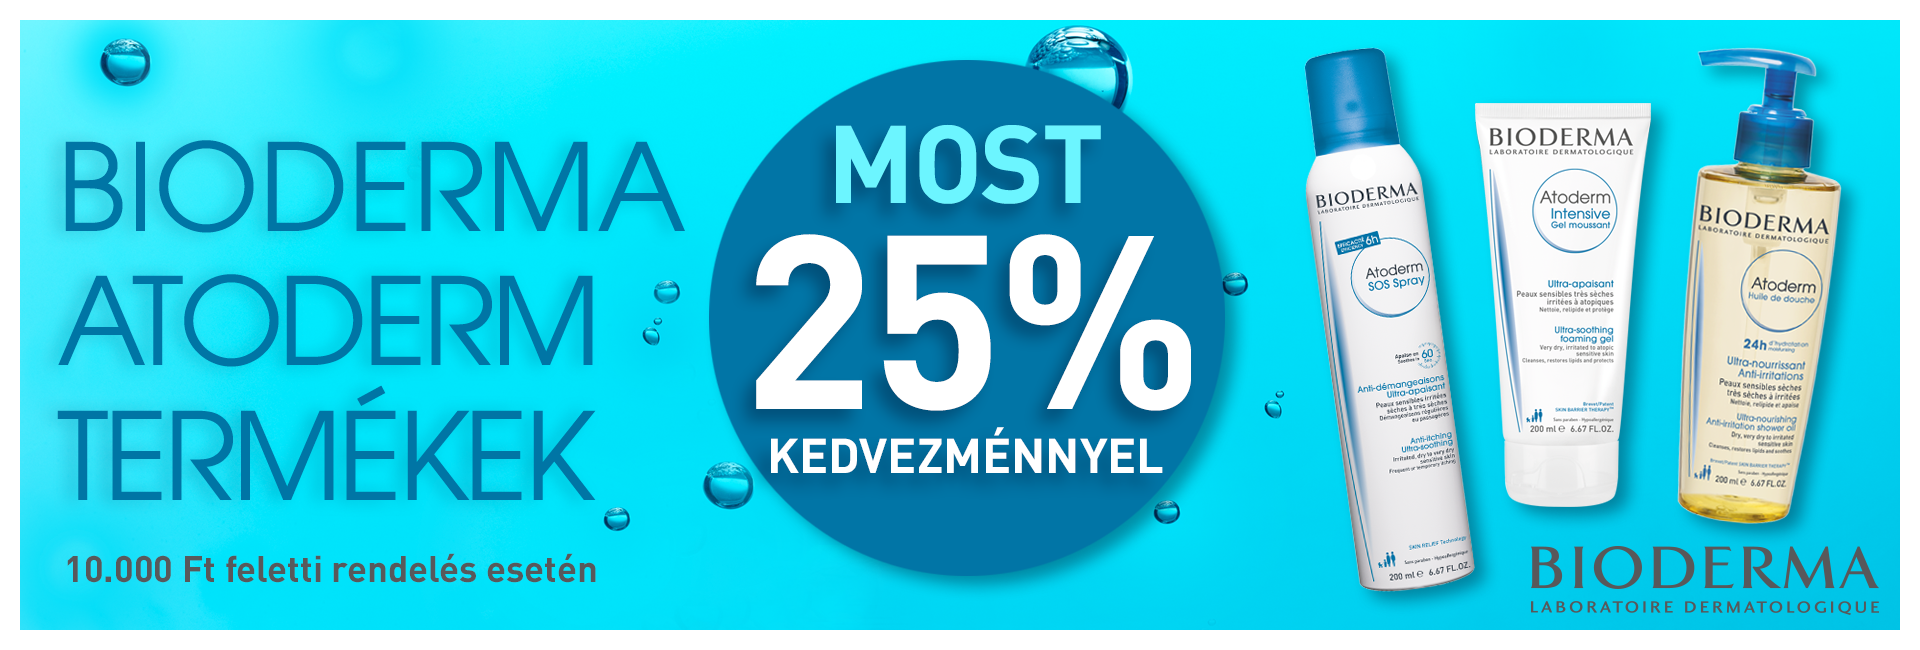 Most minden Bioderma Atoderm termékre 25% kedvezményt adunk!